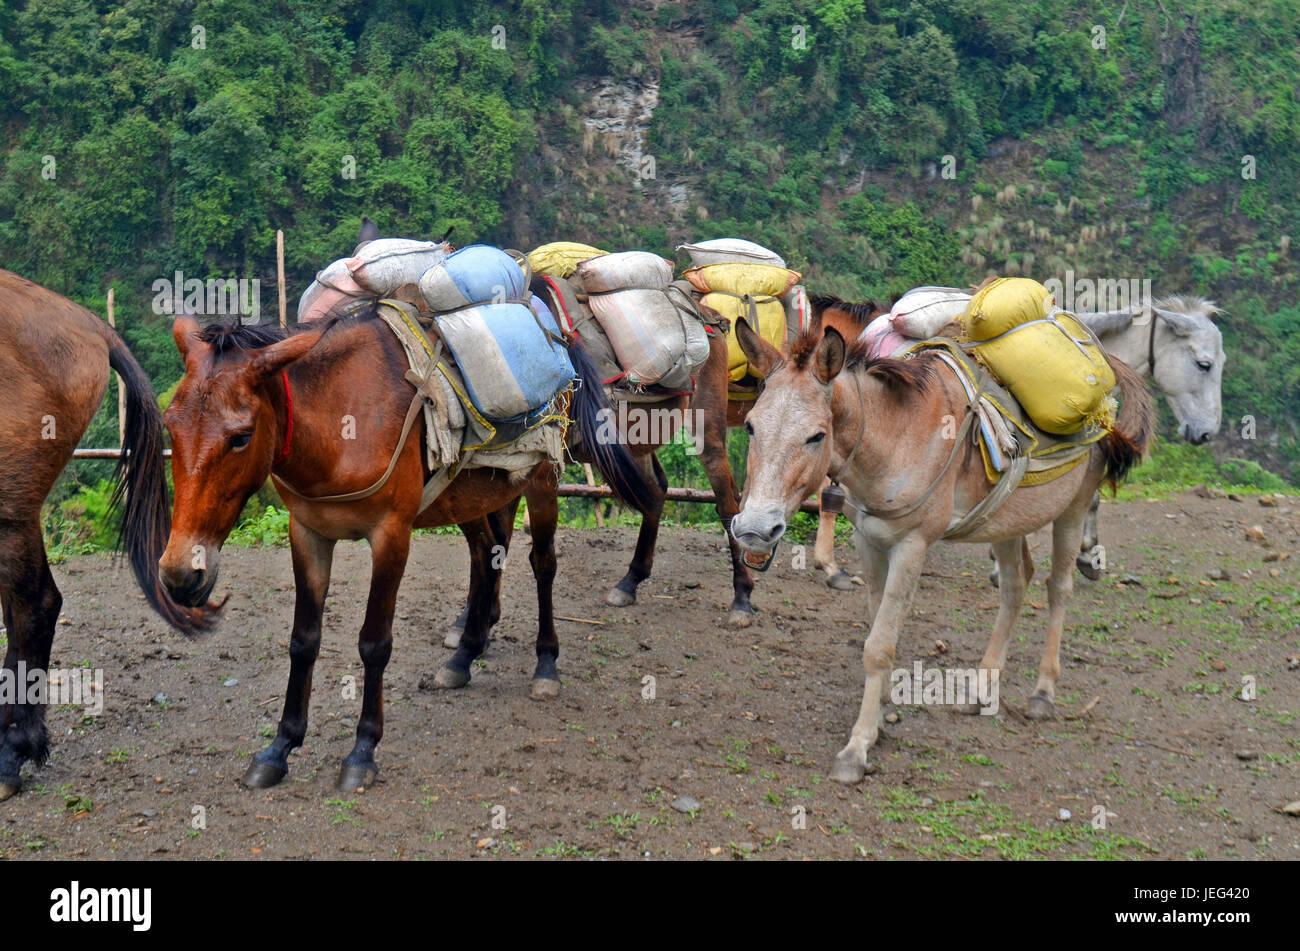 Horses with hard burden. Nepal - Stock Image